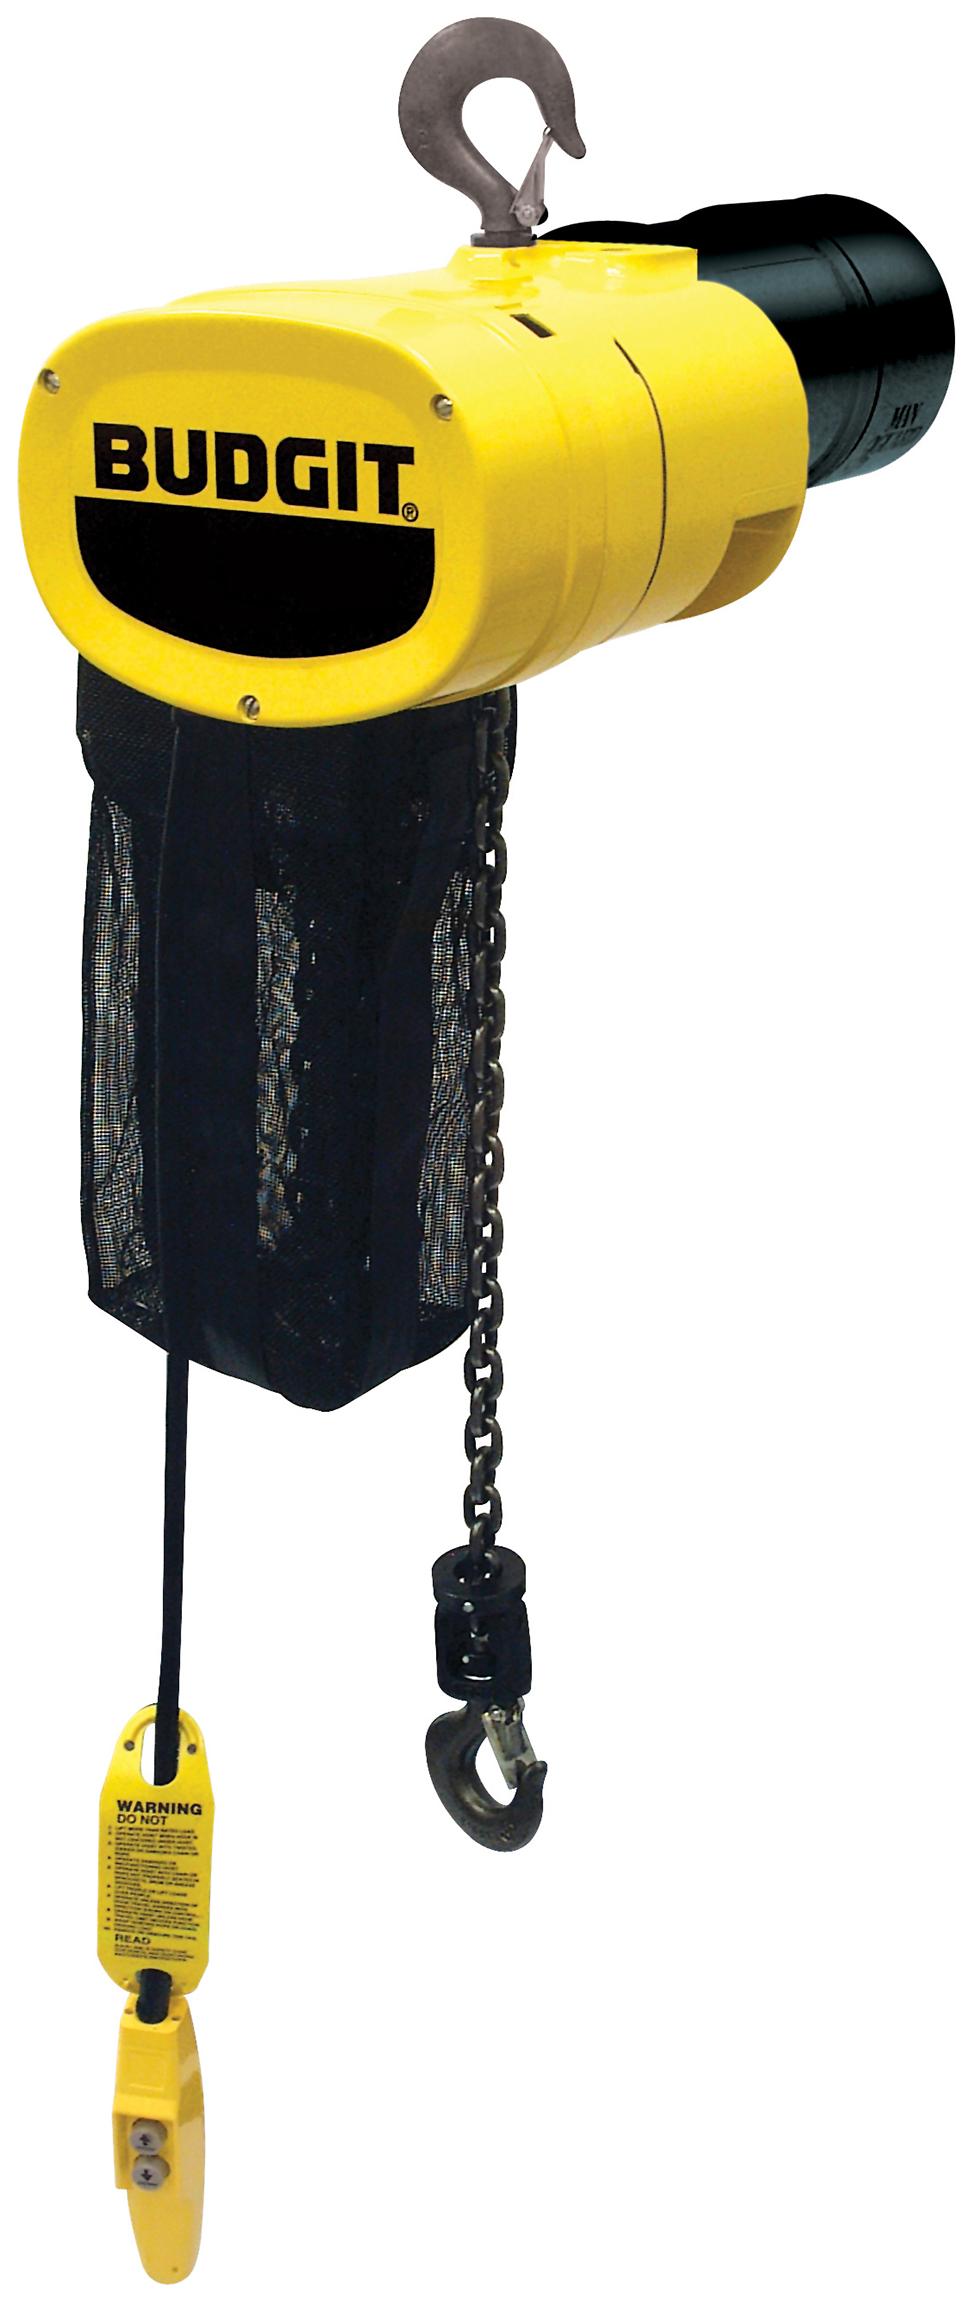 schematic on 3 4 ton 2-ton budgit man guard electric chain hoist, three  phase on 3 4 ton